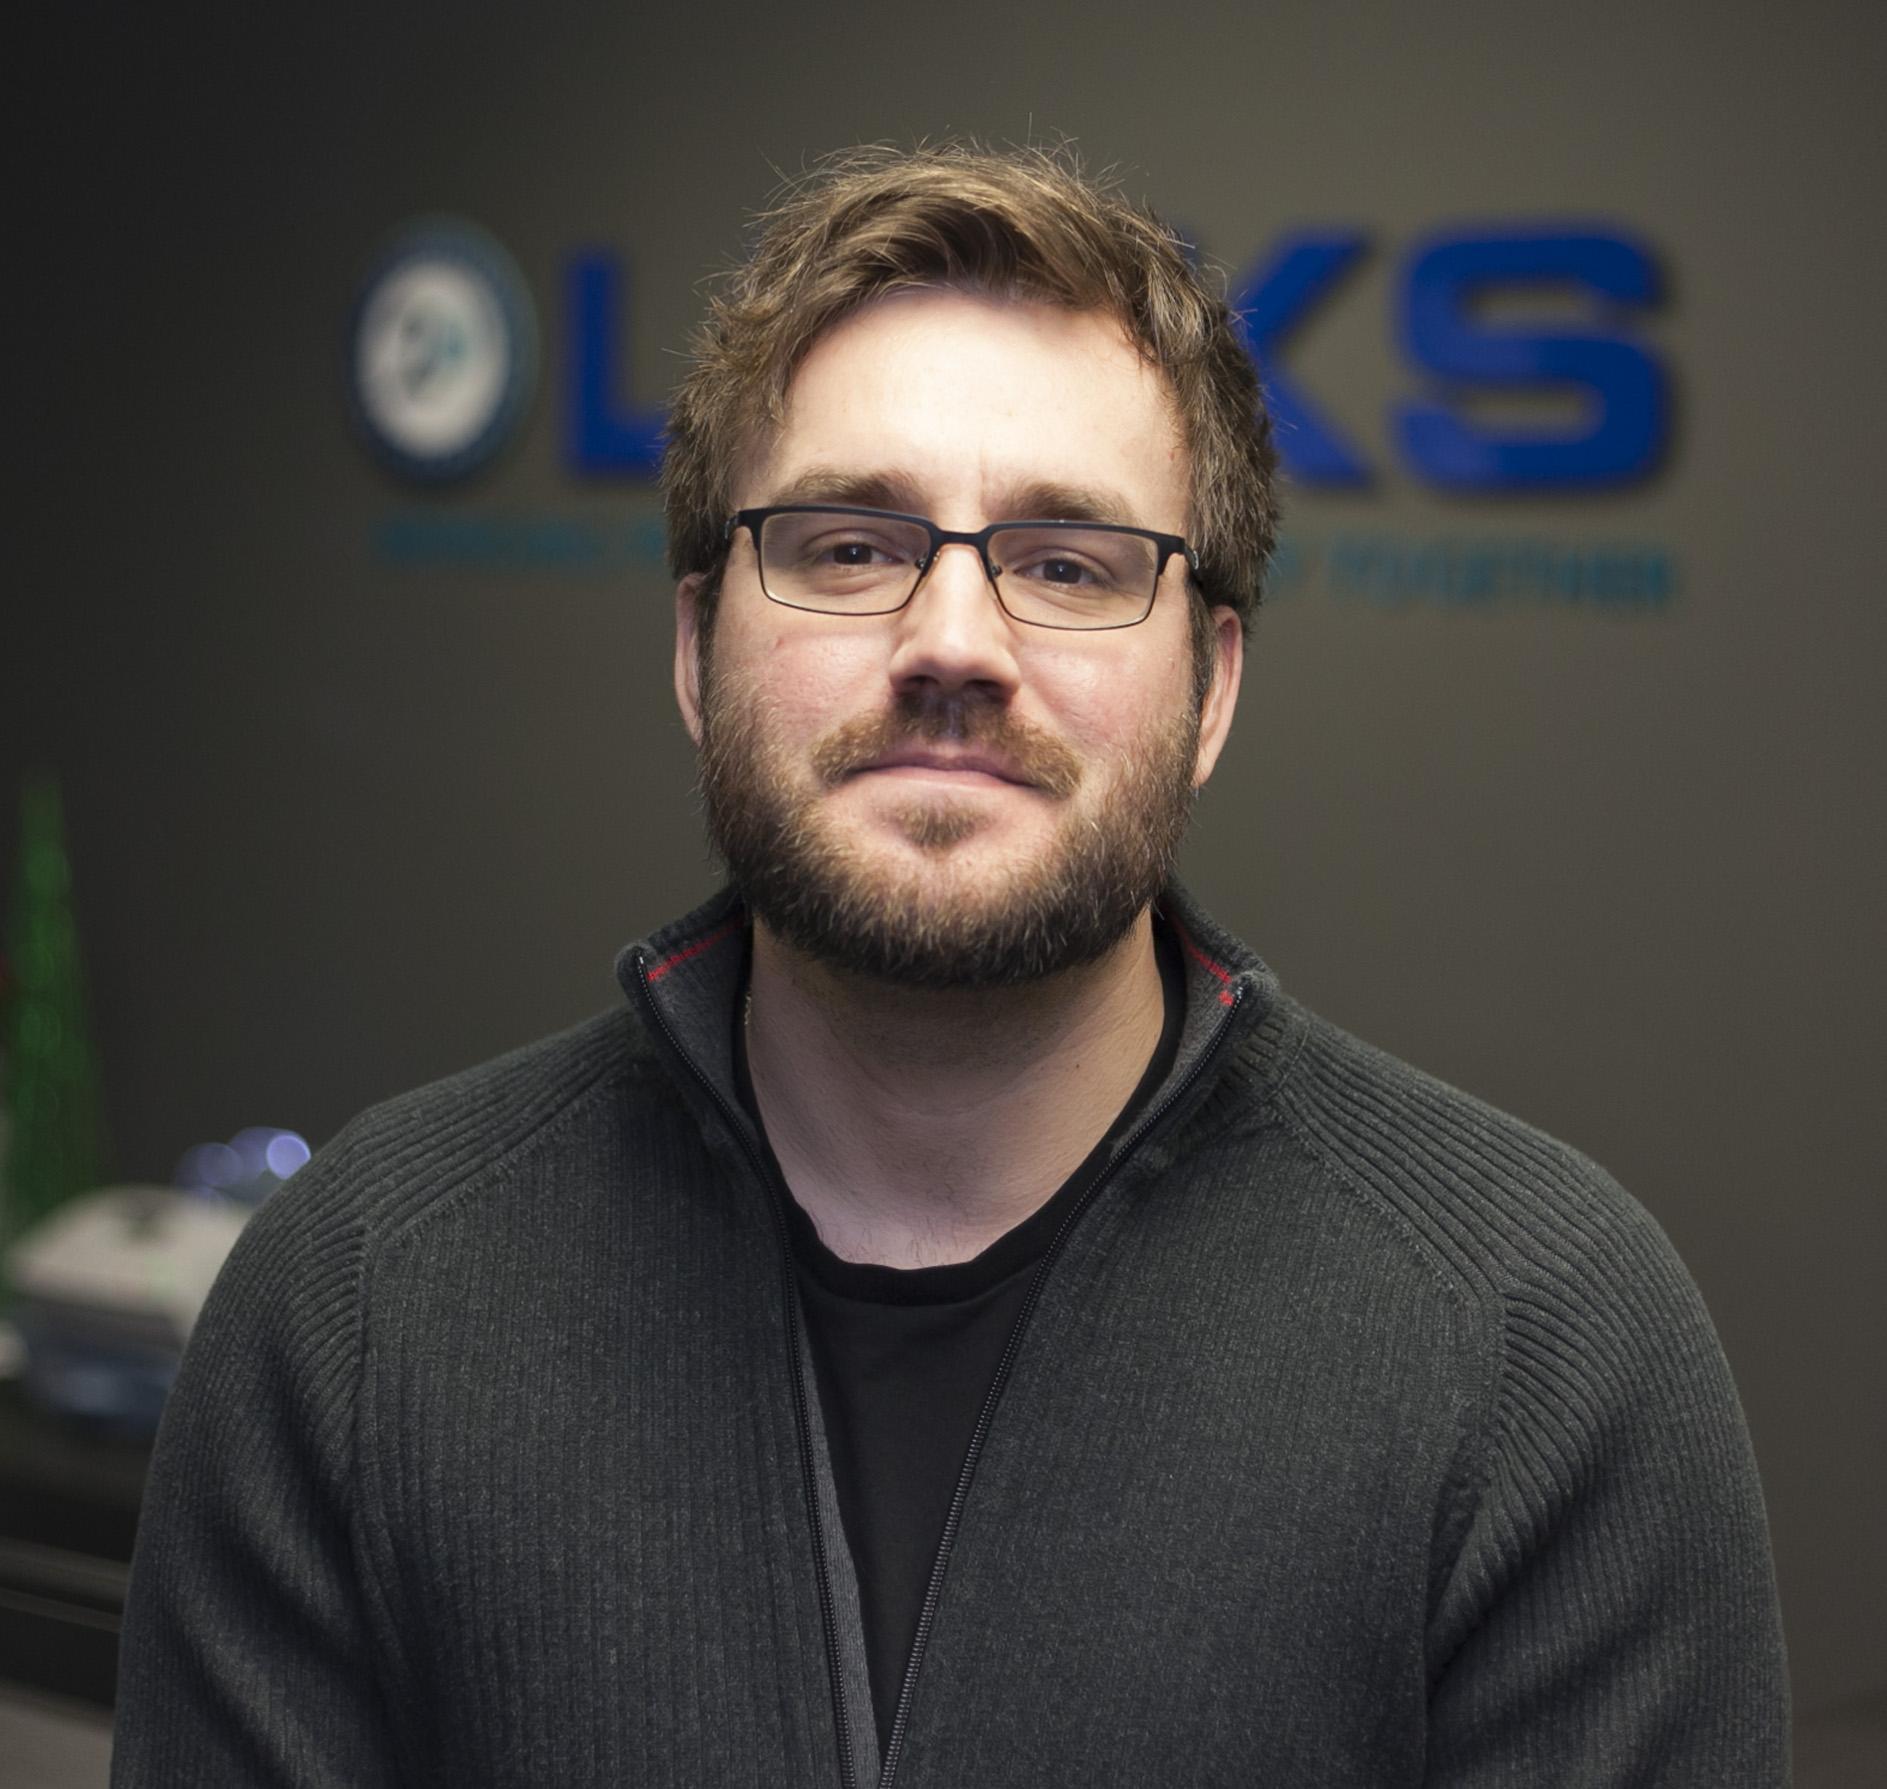 Nick Janasek